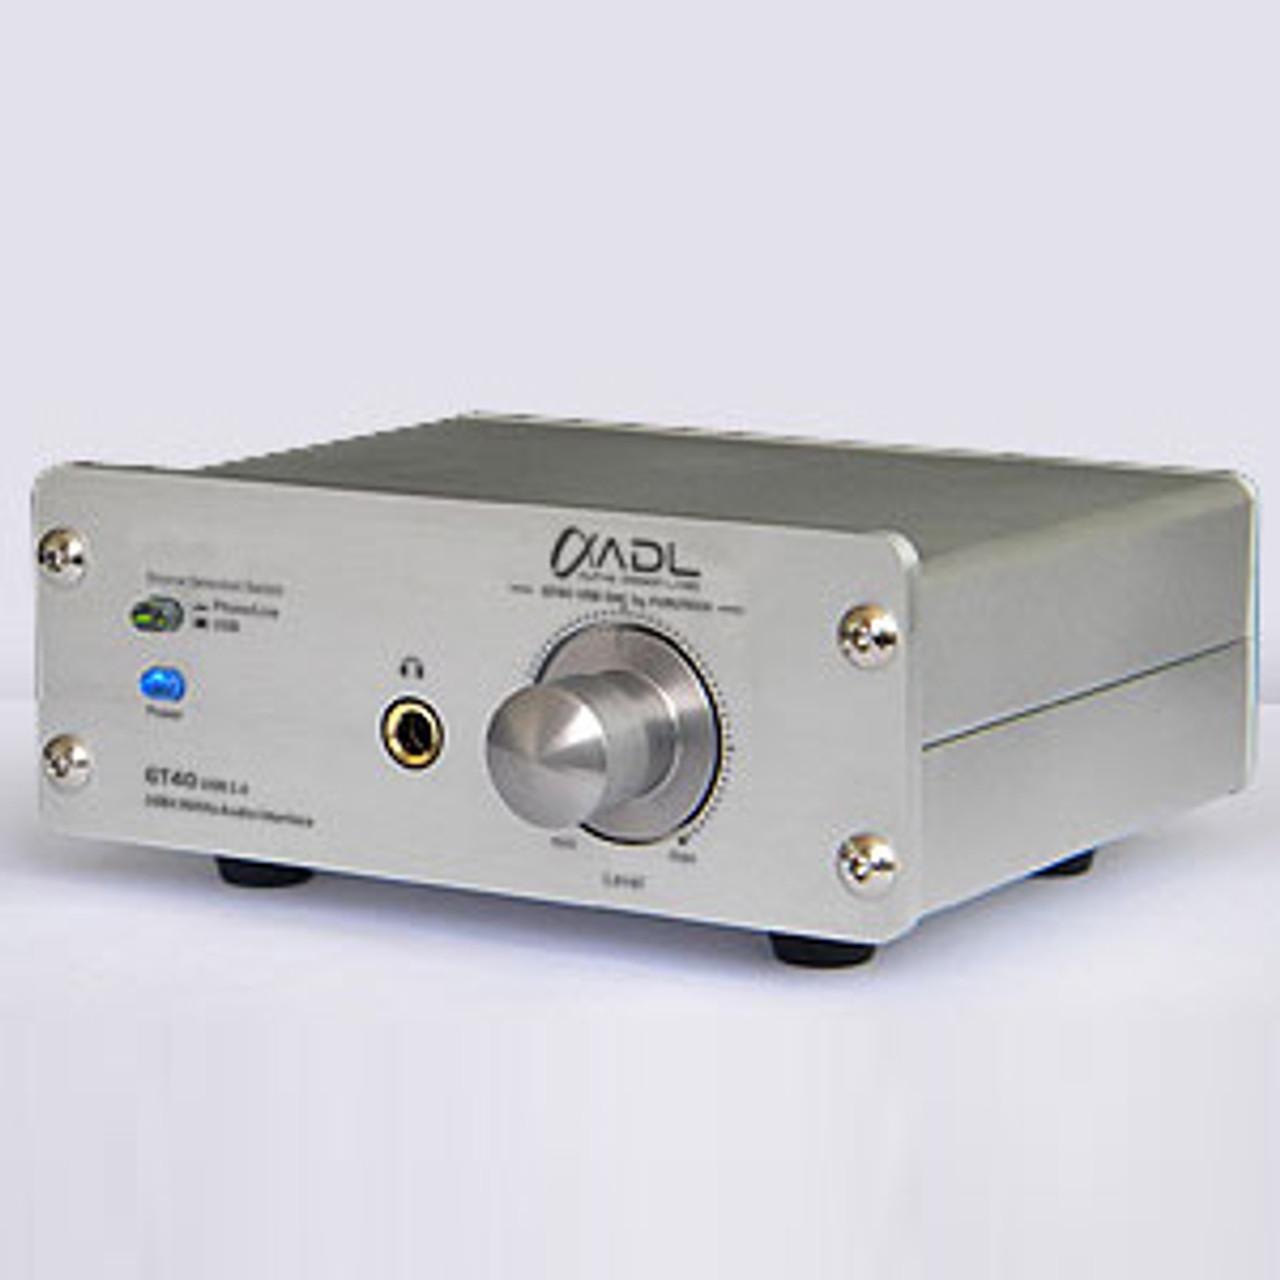 ADL GT40 Alpha Dac, Headphone Amplifier, Phono Stage & Preamplifier